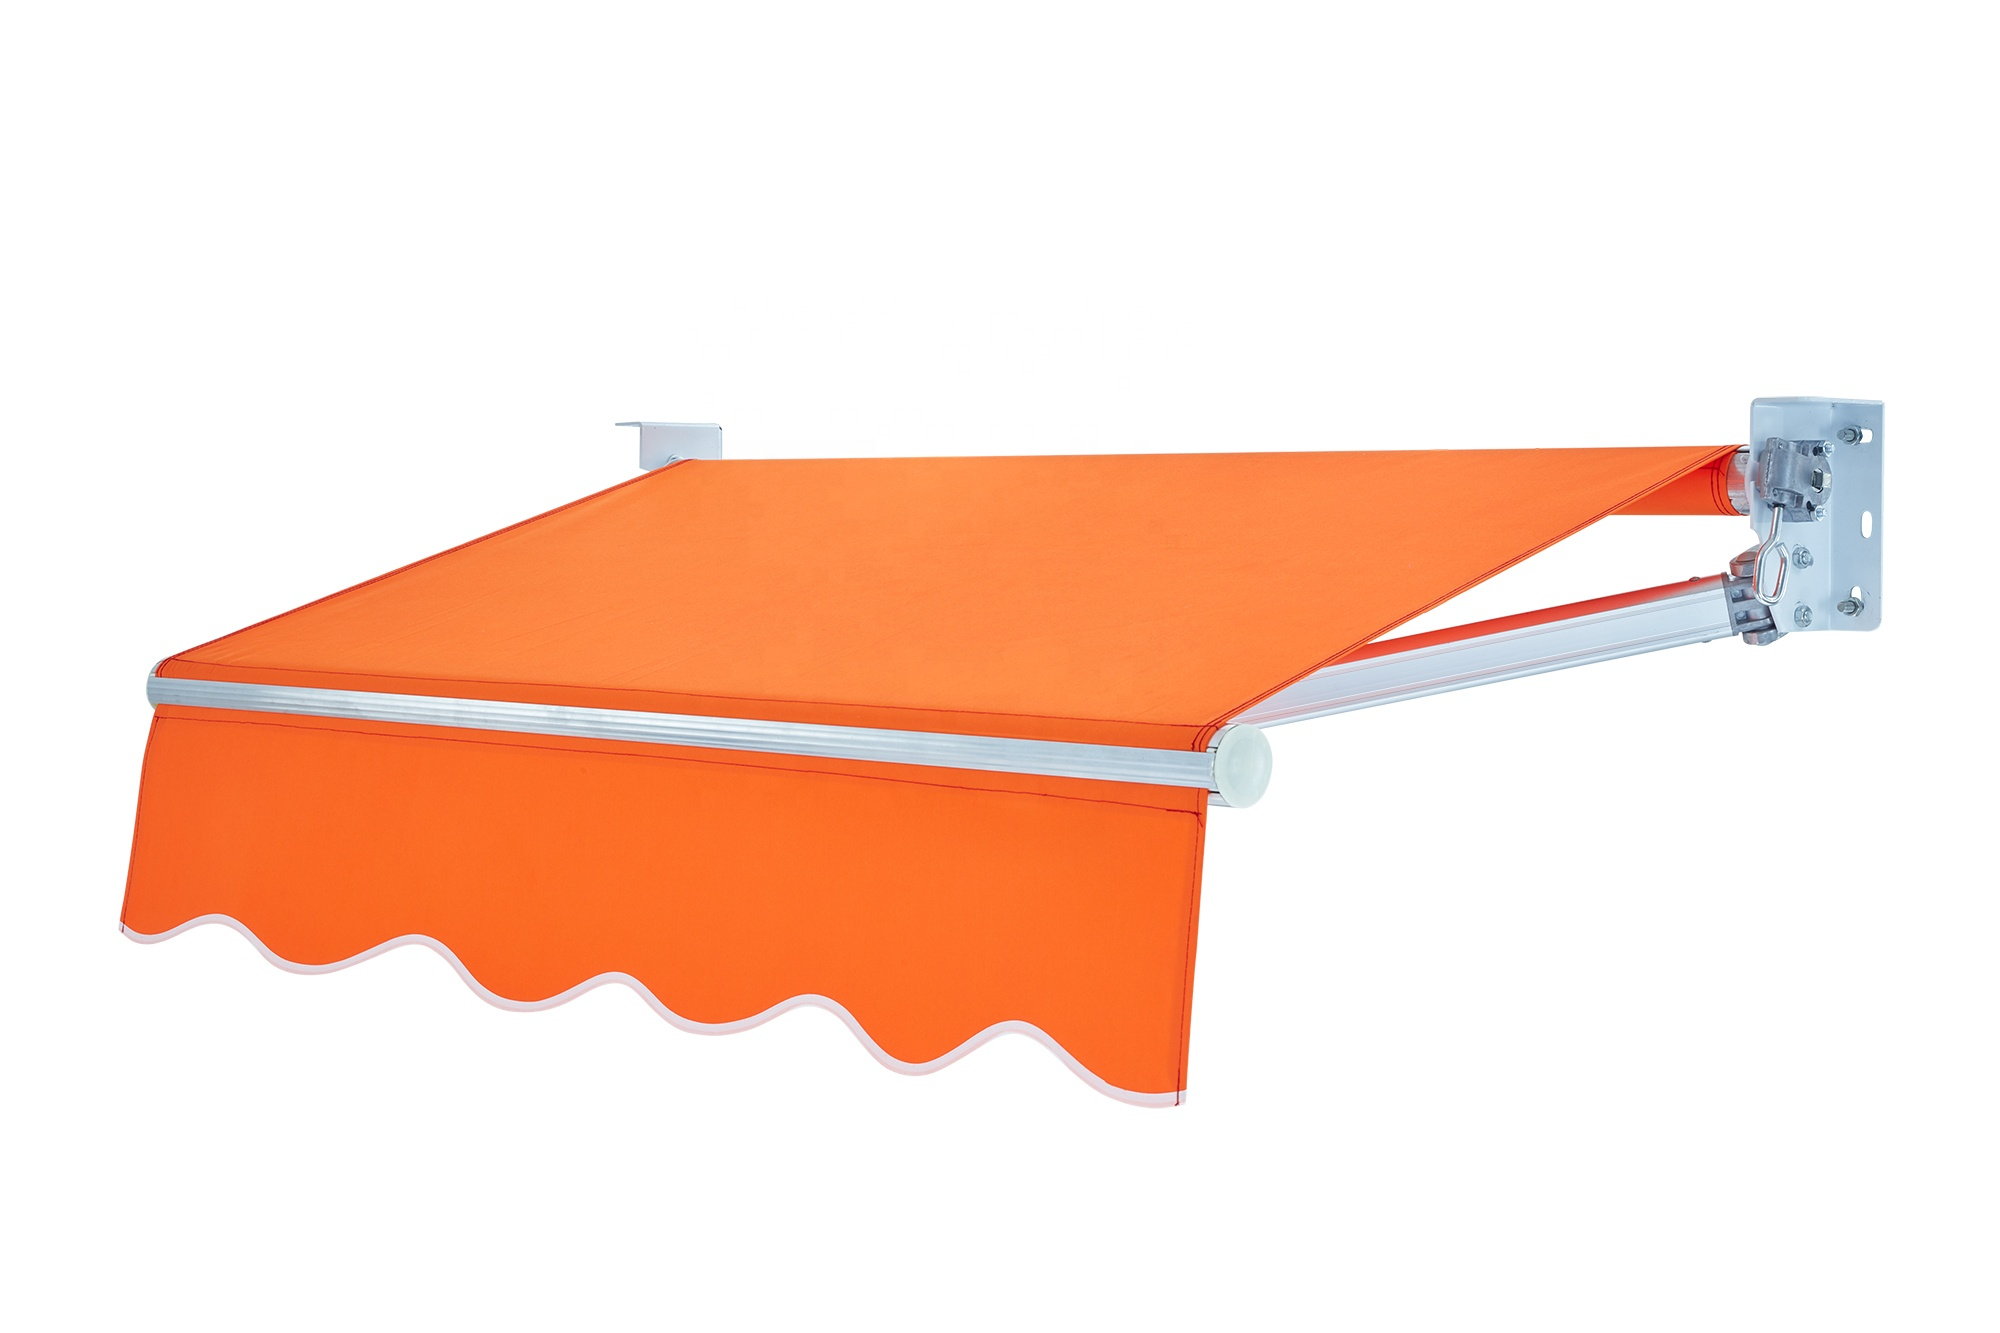 Aluminum Profile Assembling Foldable Awning